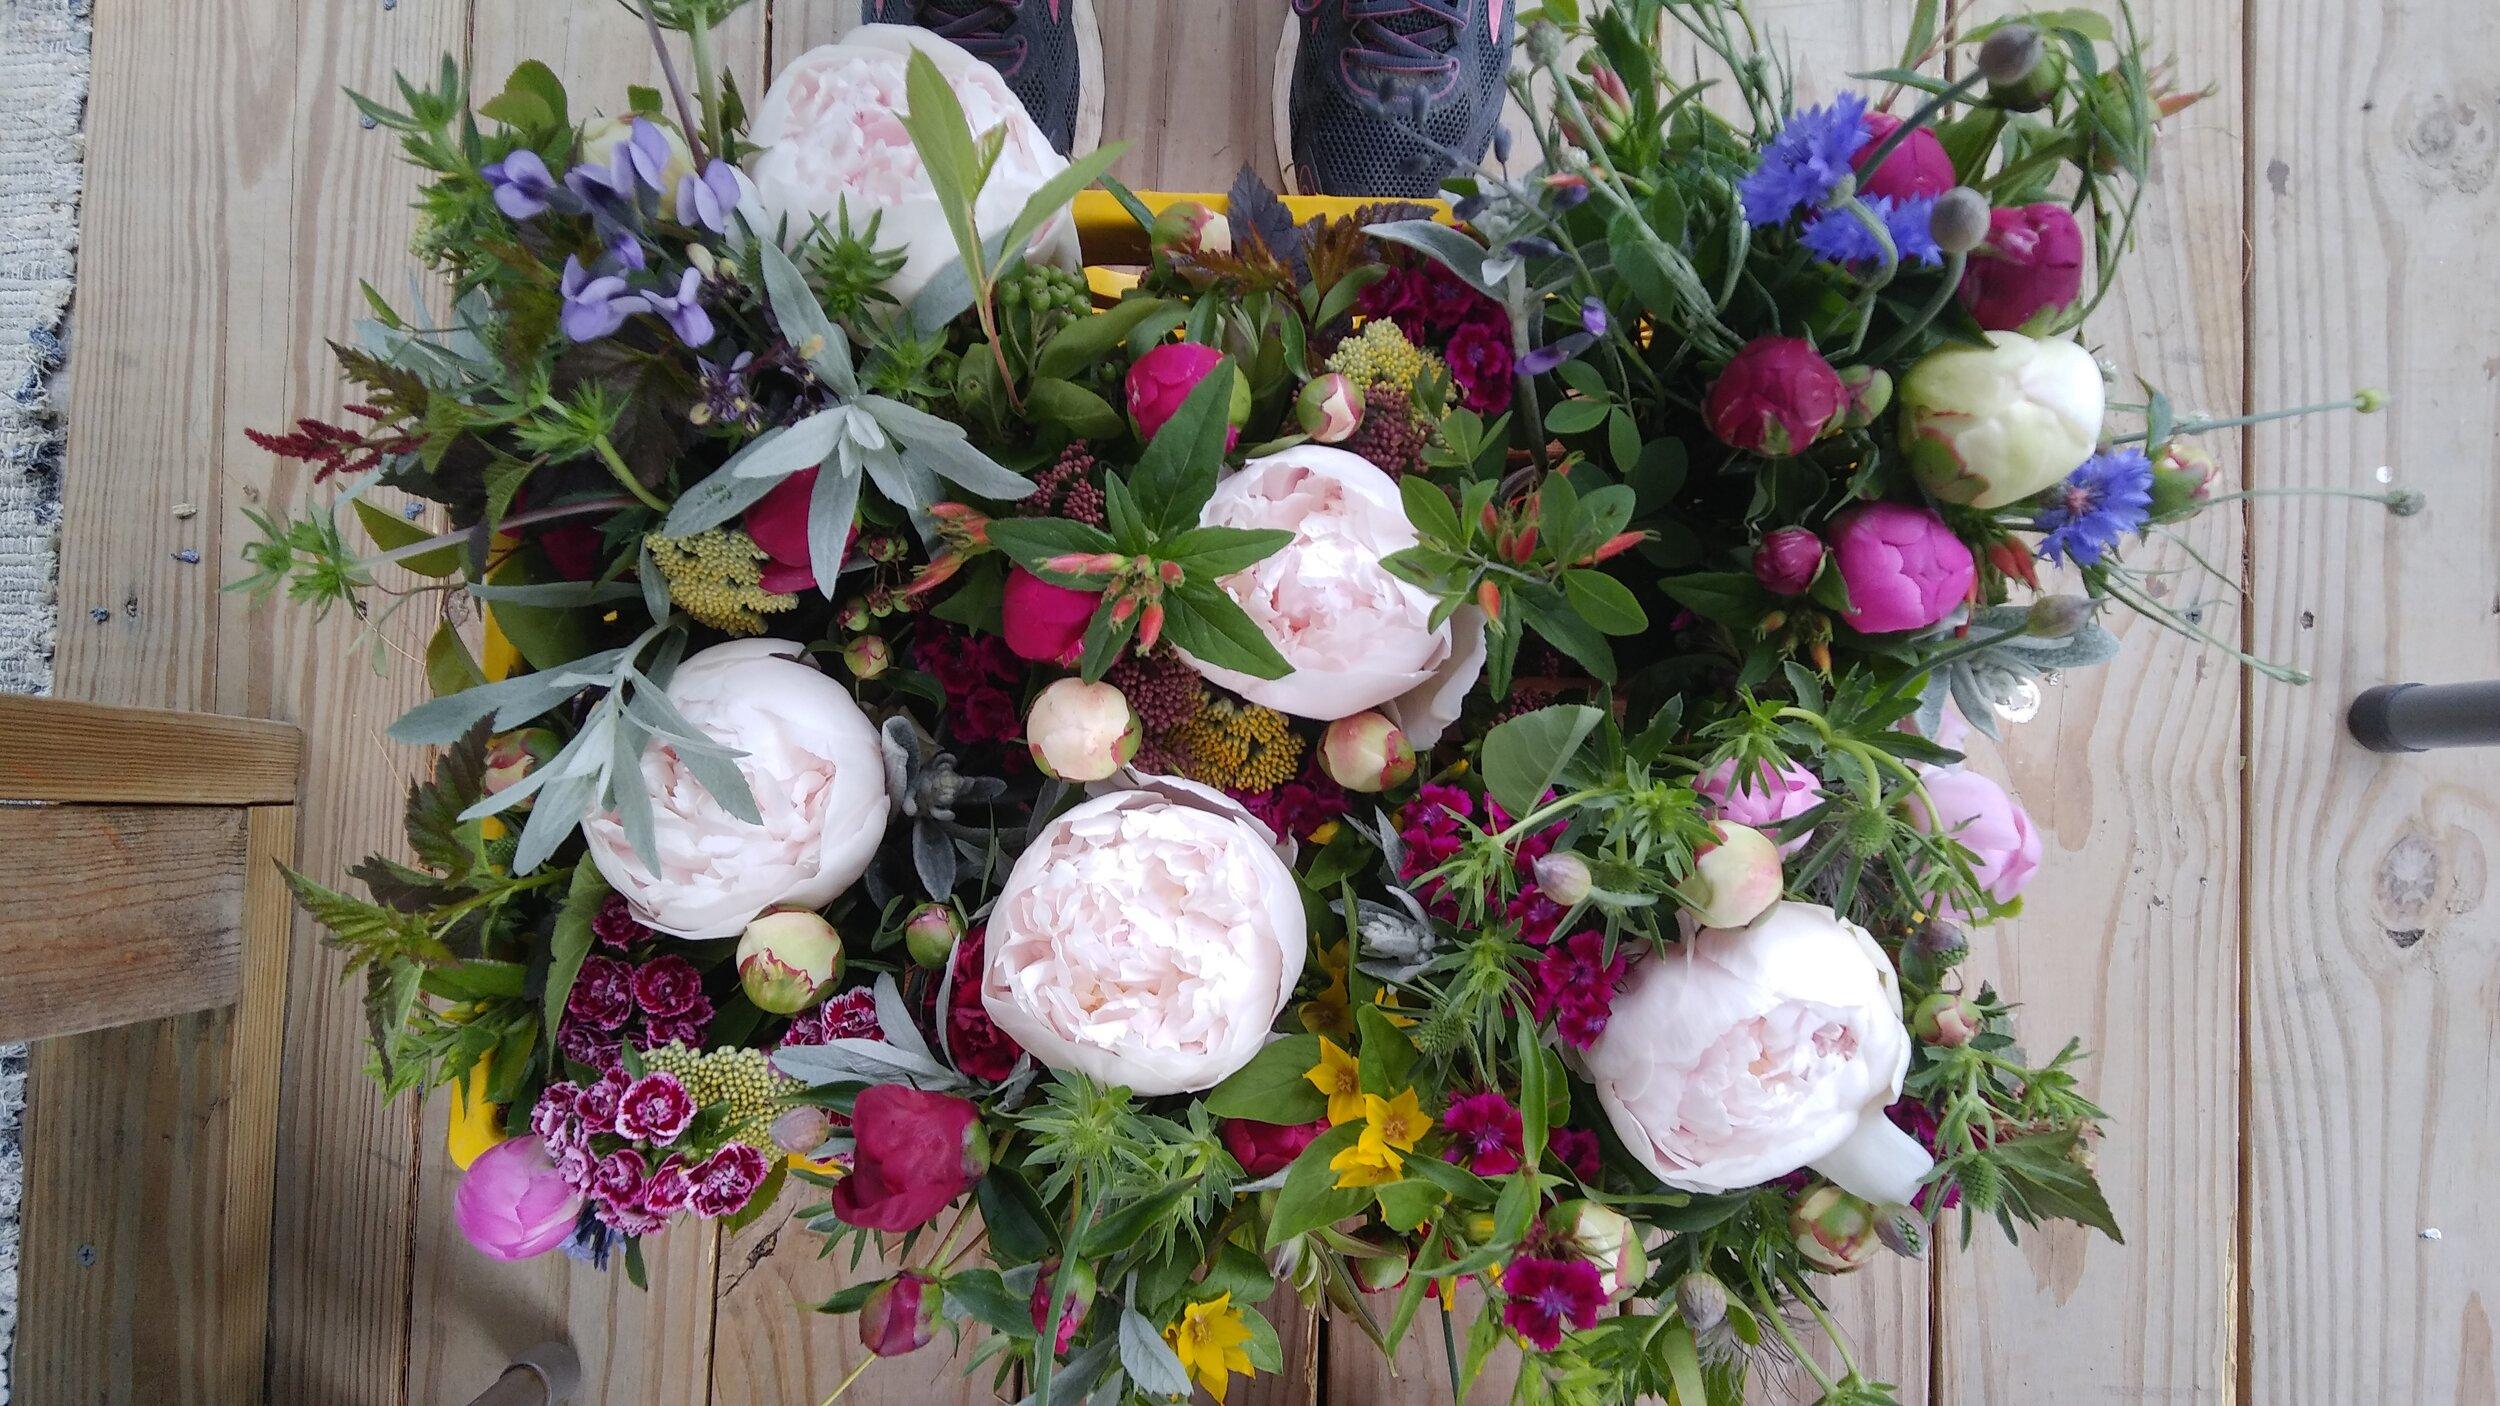 peony bouquet prep for night market.jpg